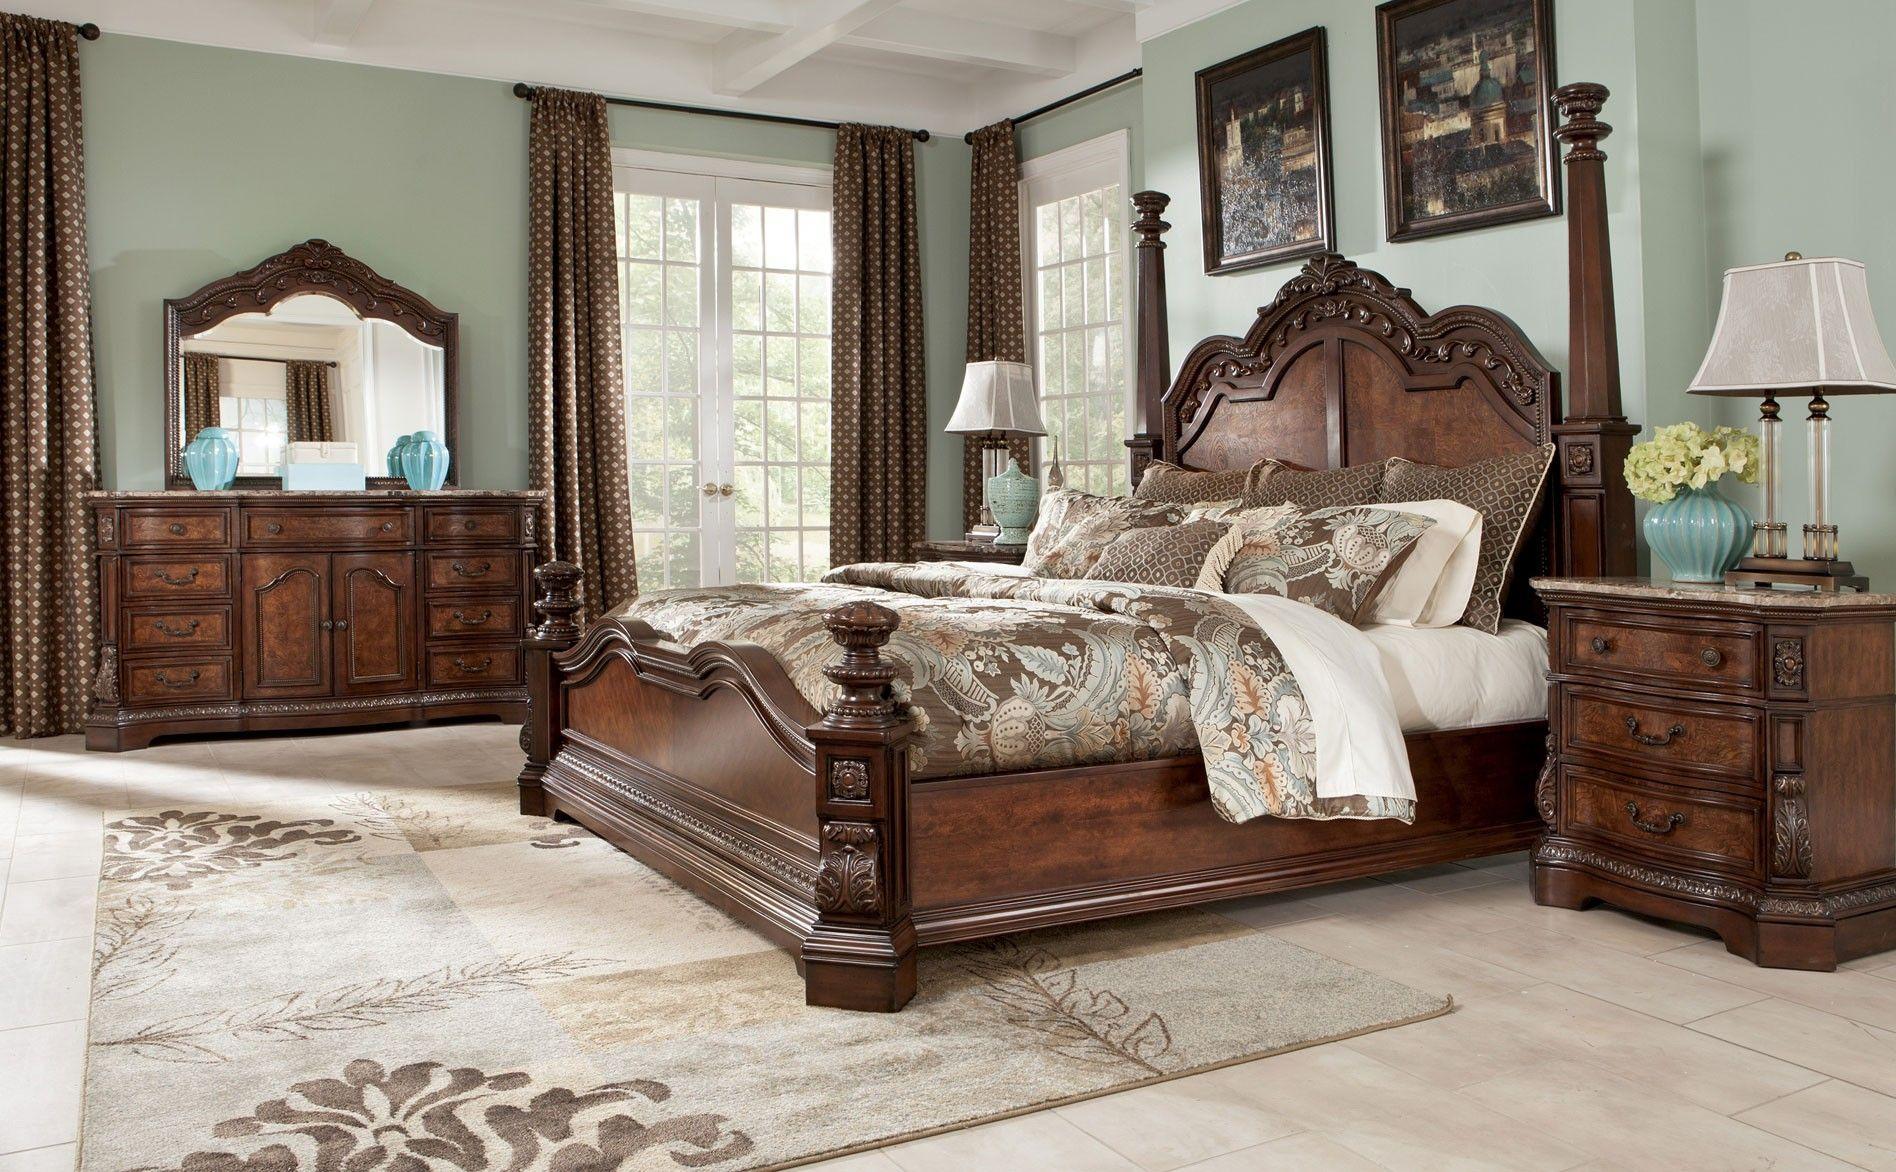 Ashley Bedroom Furniture > PierPointSprings.com